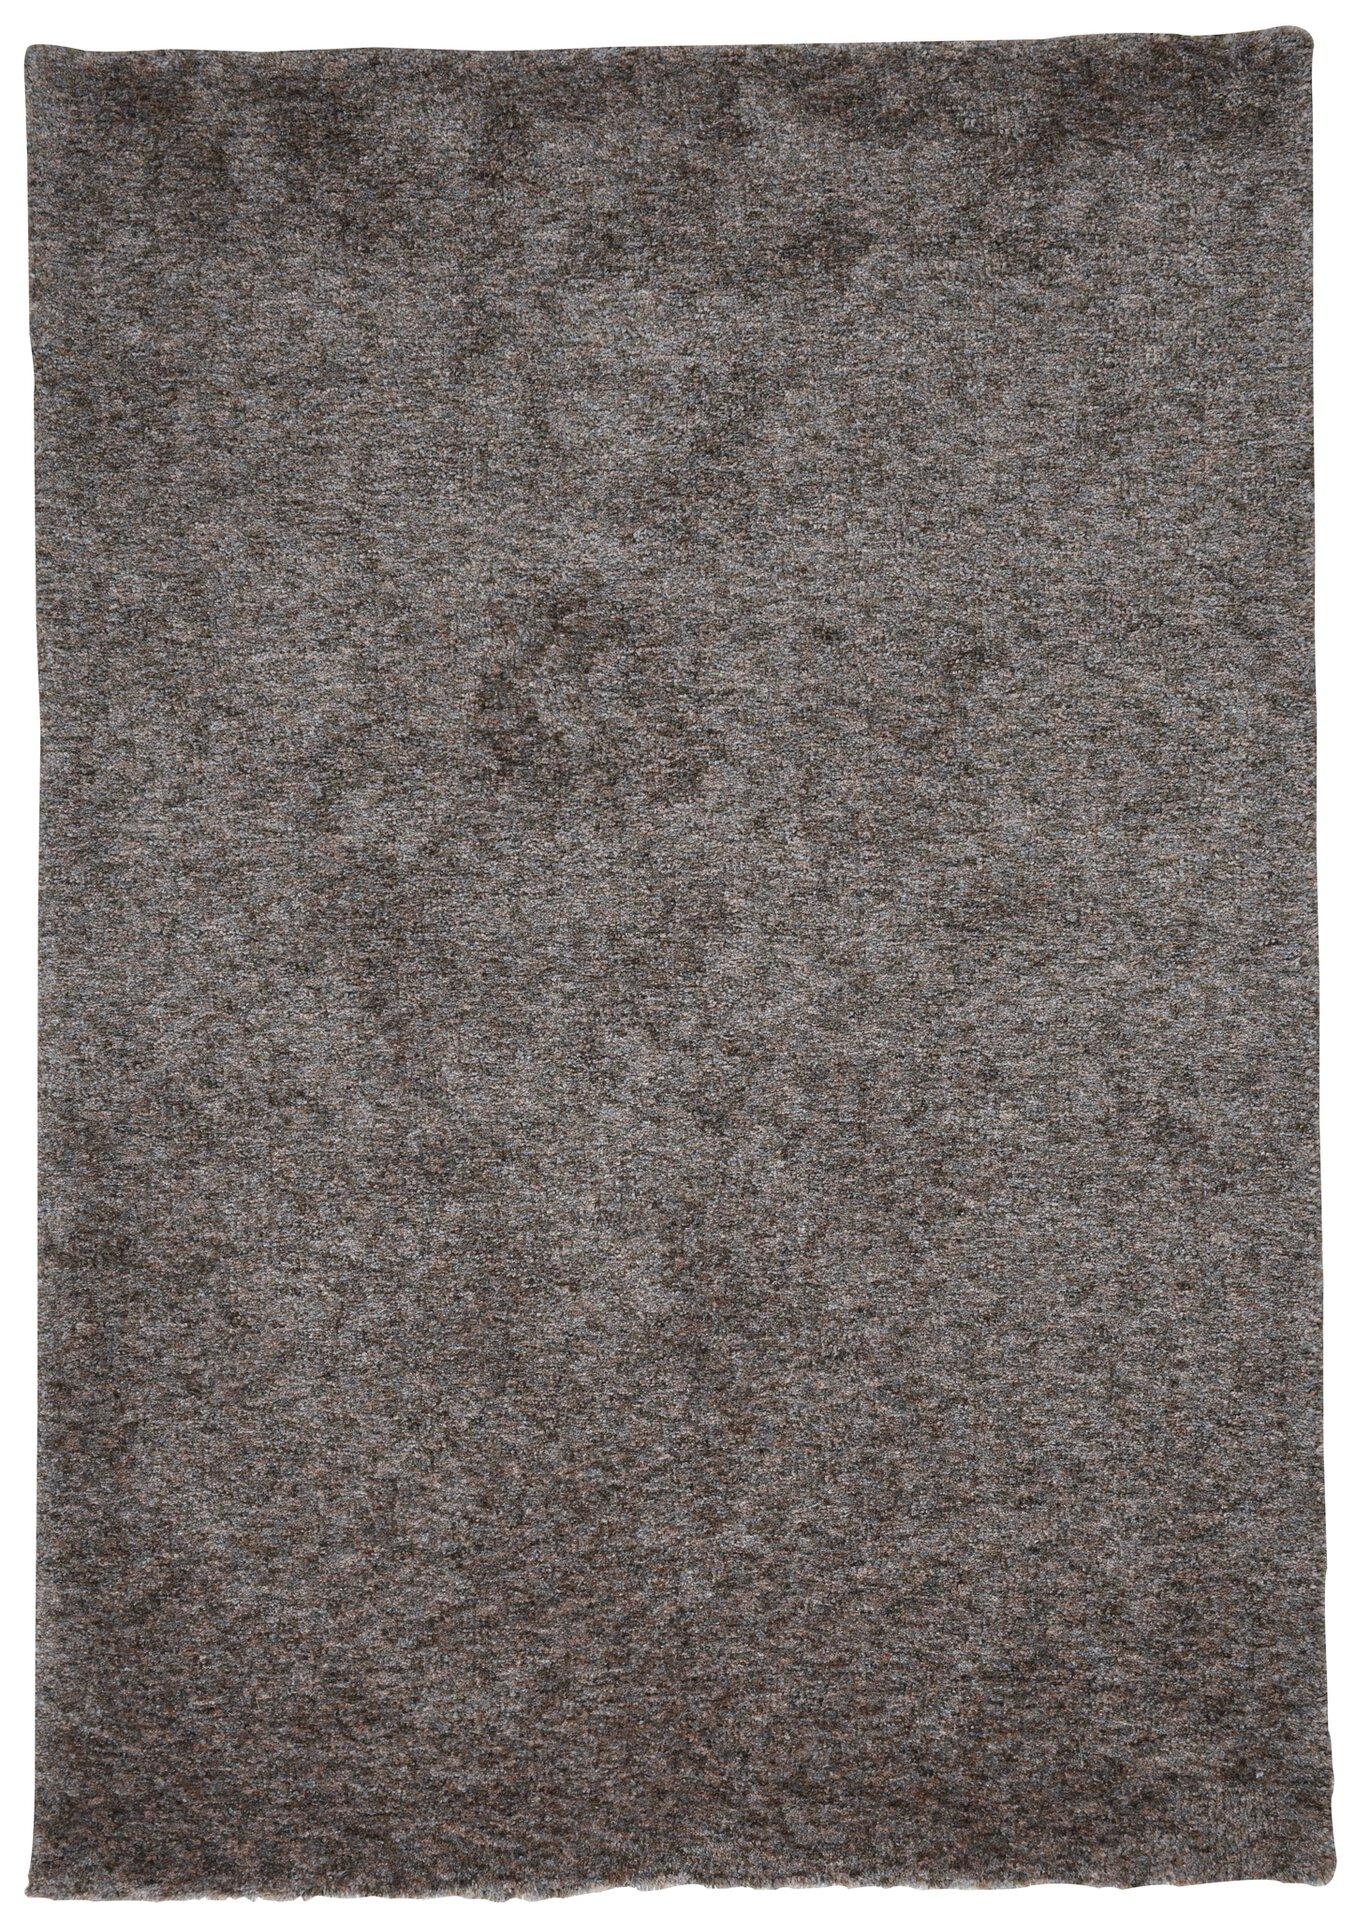 Handtuftteppich Roberto Gino Falcone Textil braun 160 x 230 cm